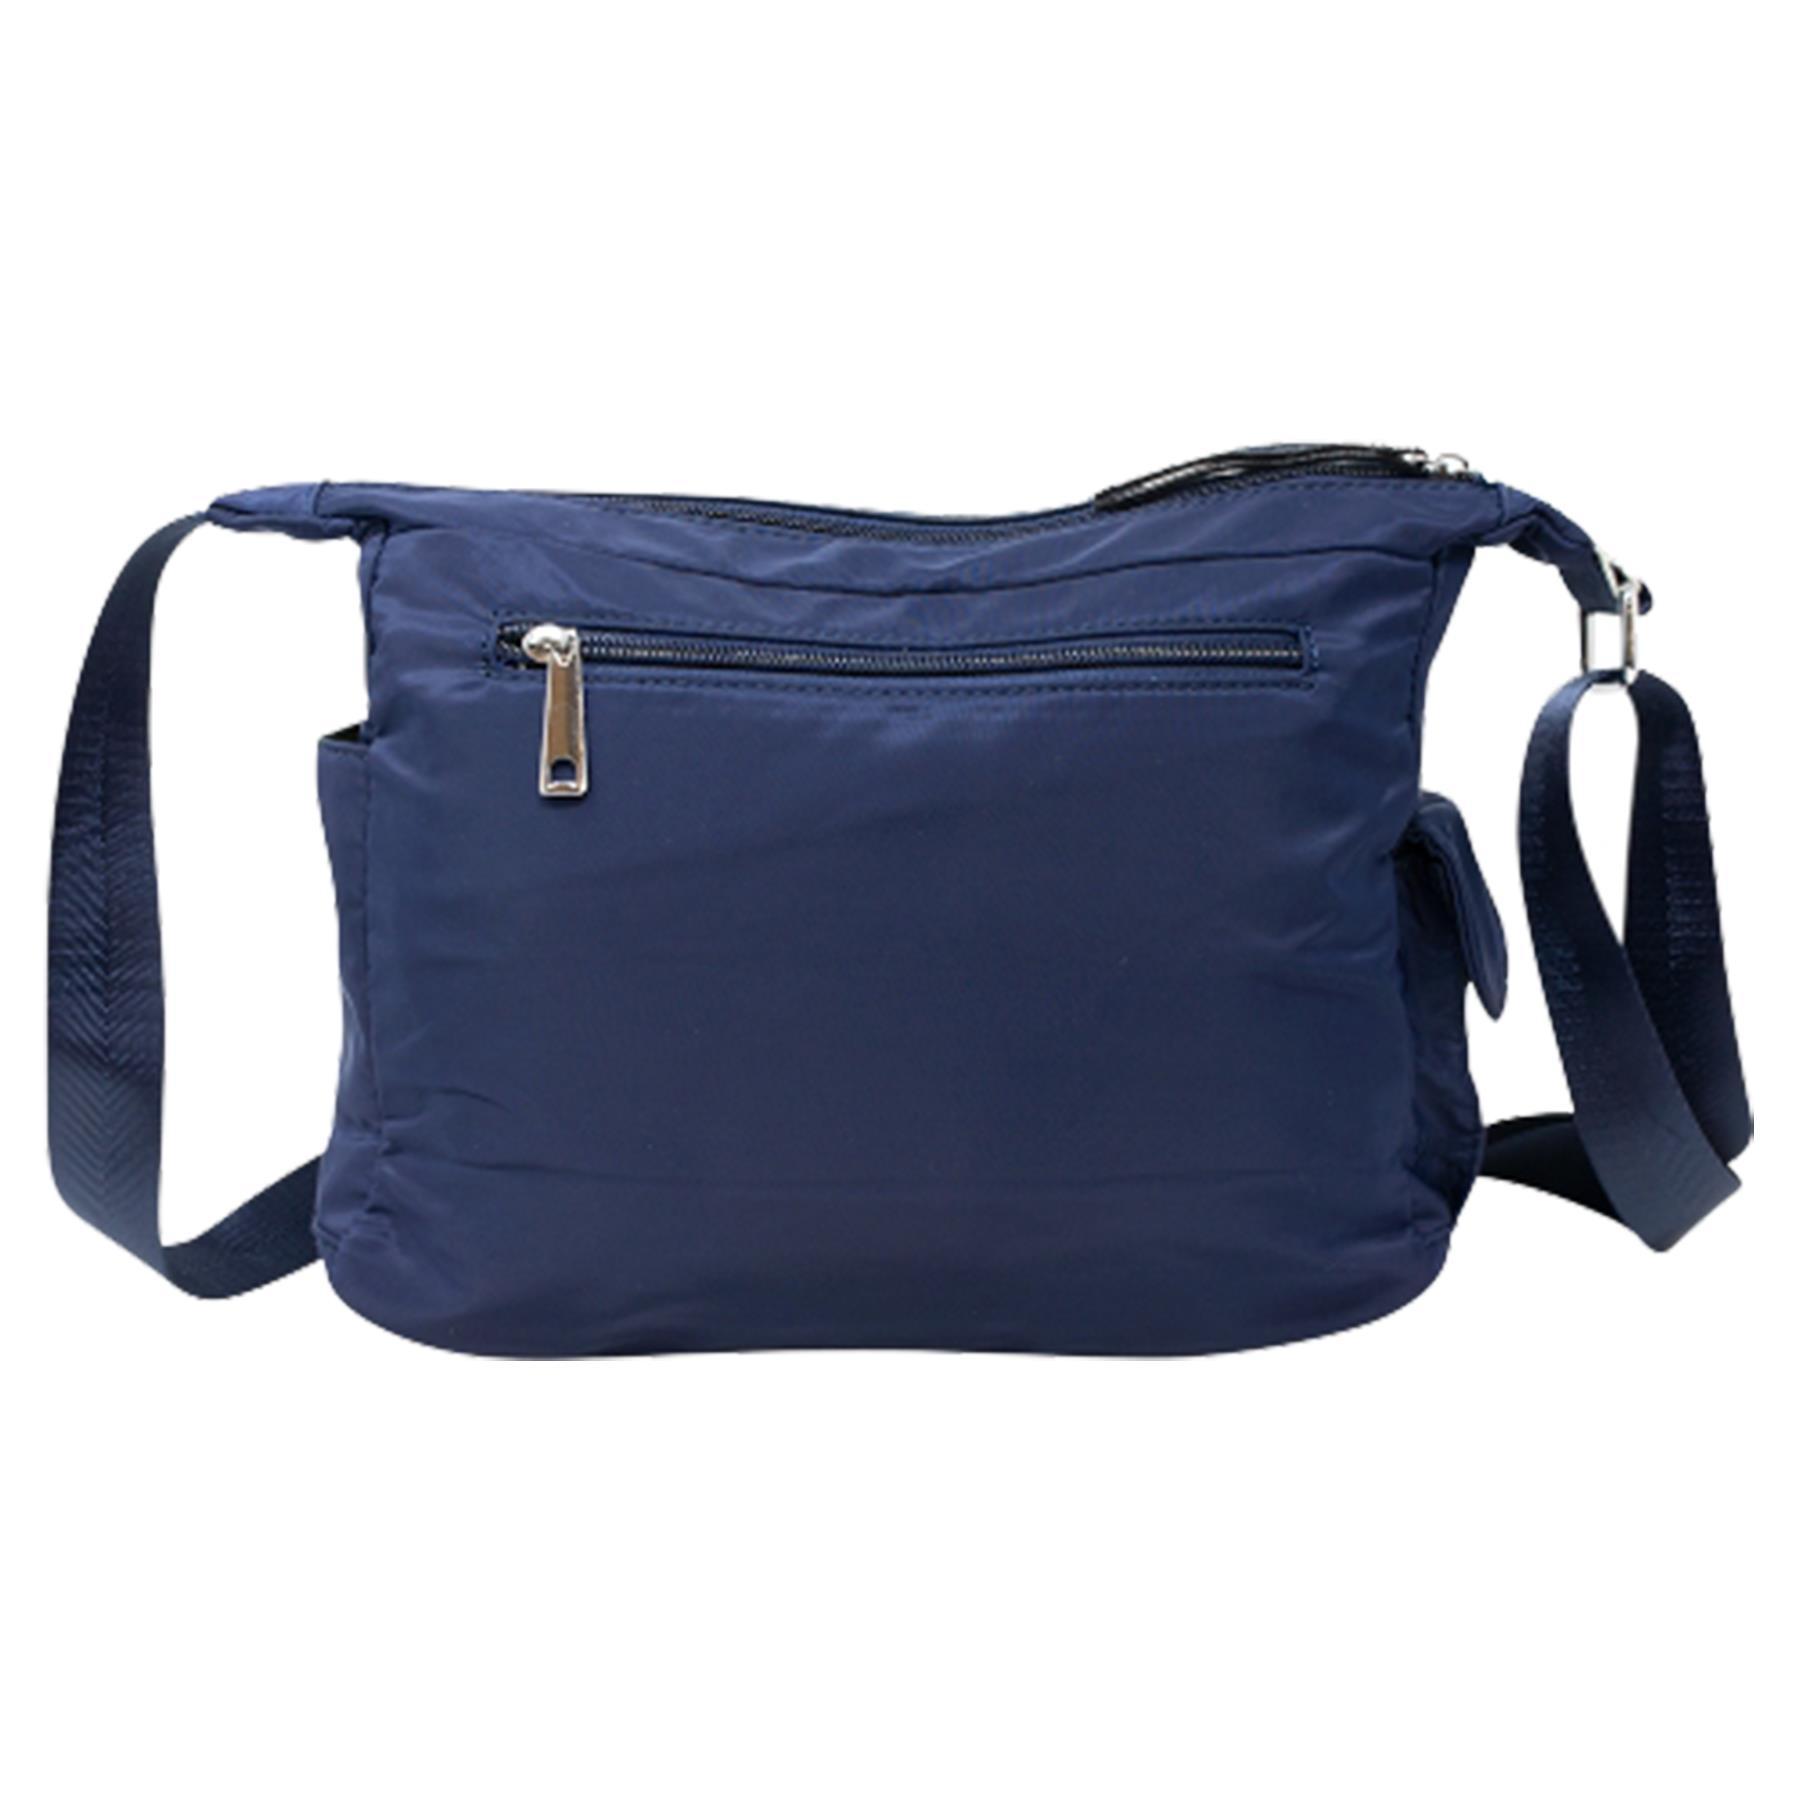 New-Ladies-Men-s-Showerproof-School-College-Practical-Basic-Crossbody-Bag thumbnail 14